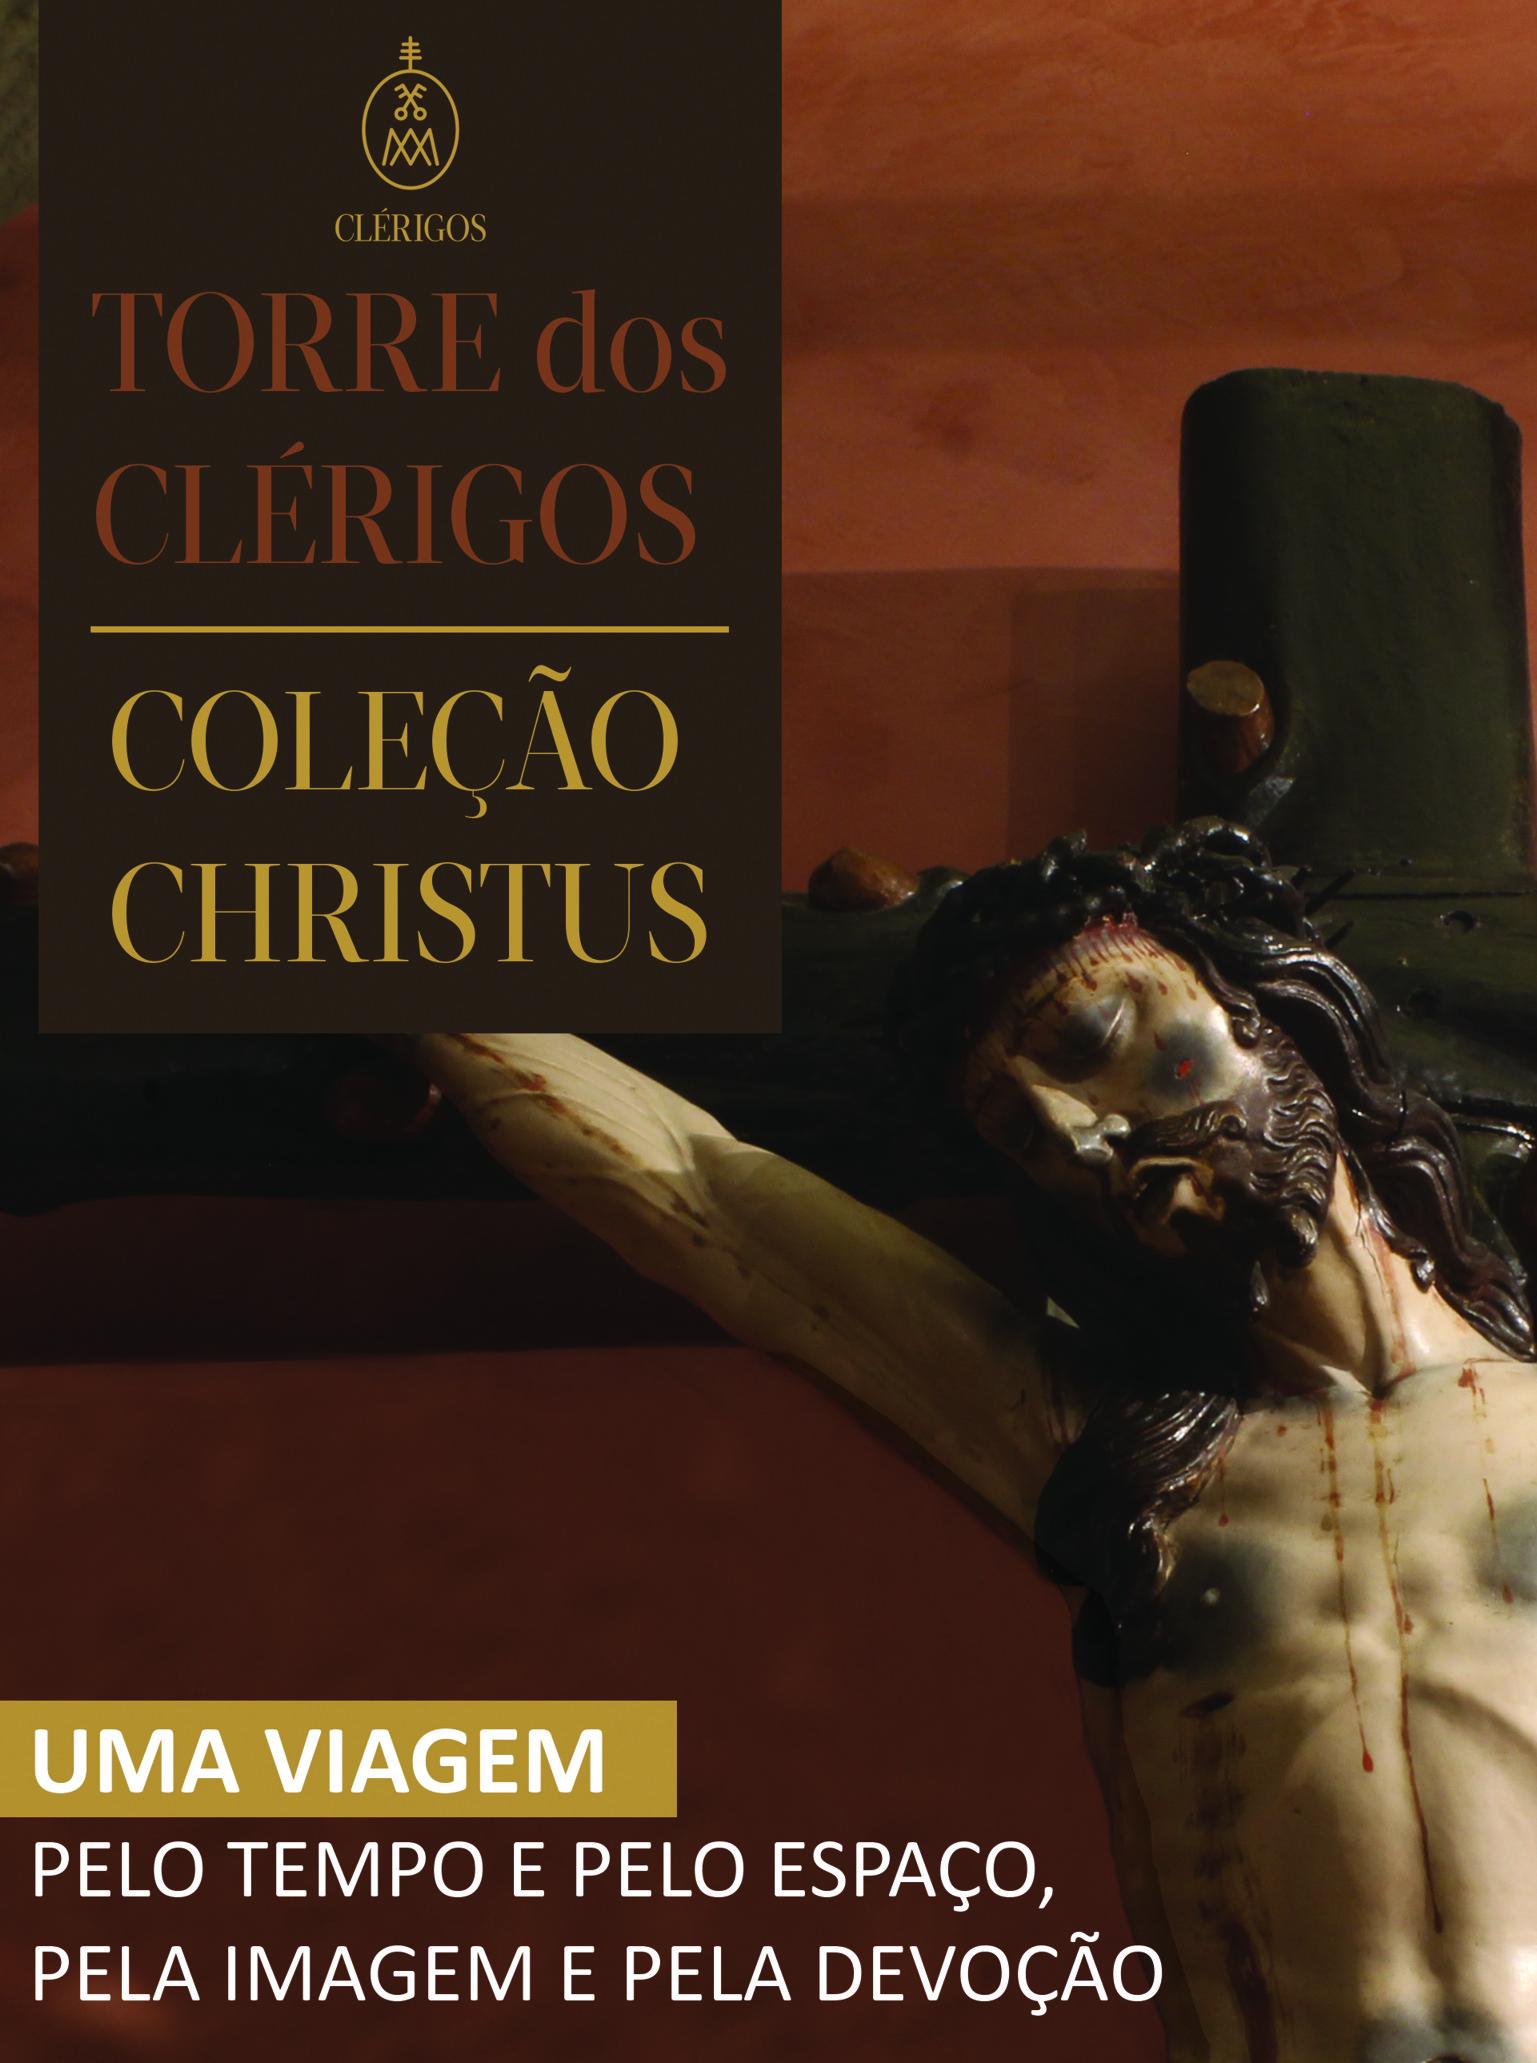 dnbci clerigos christus